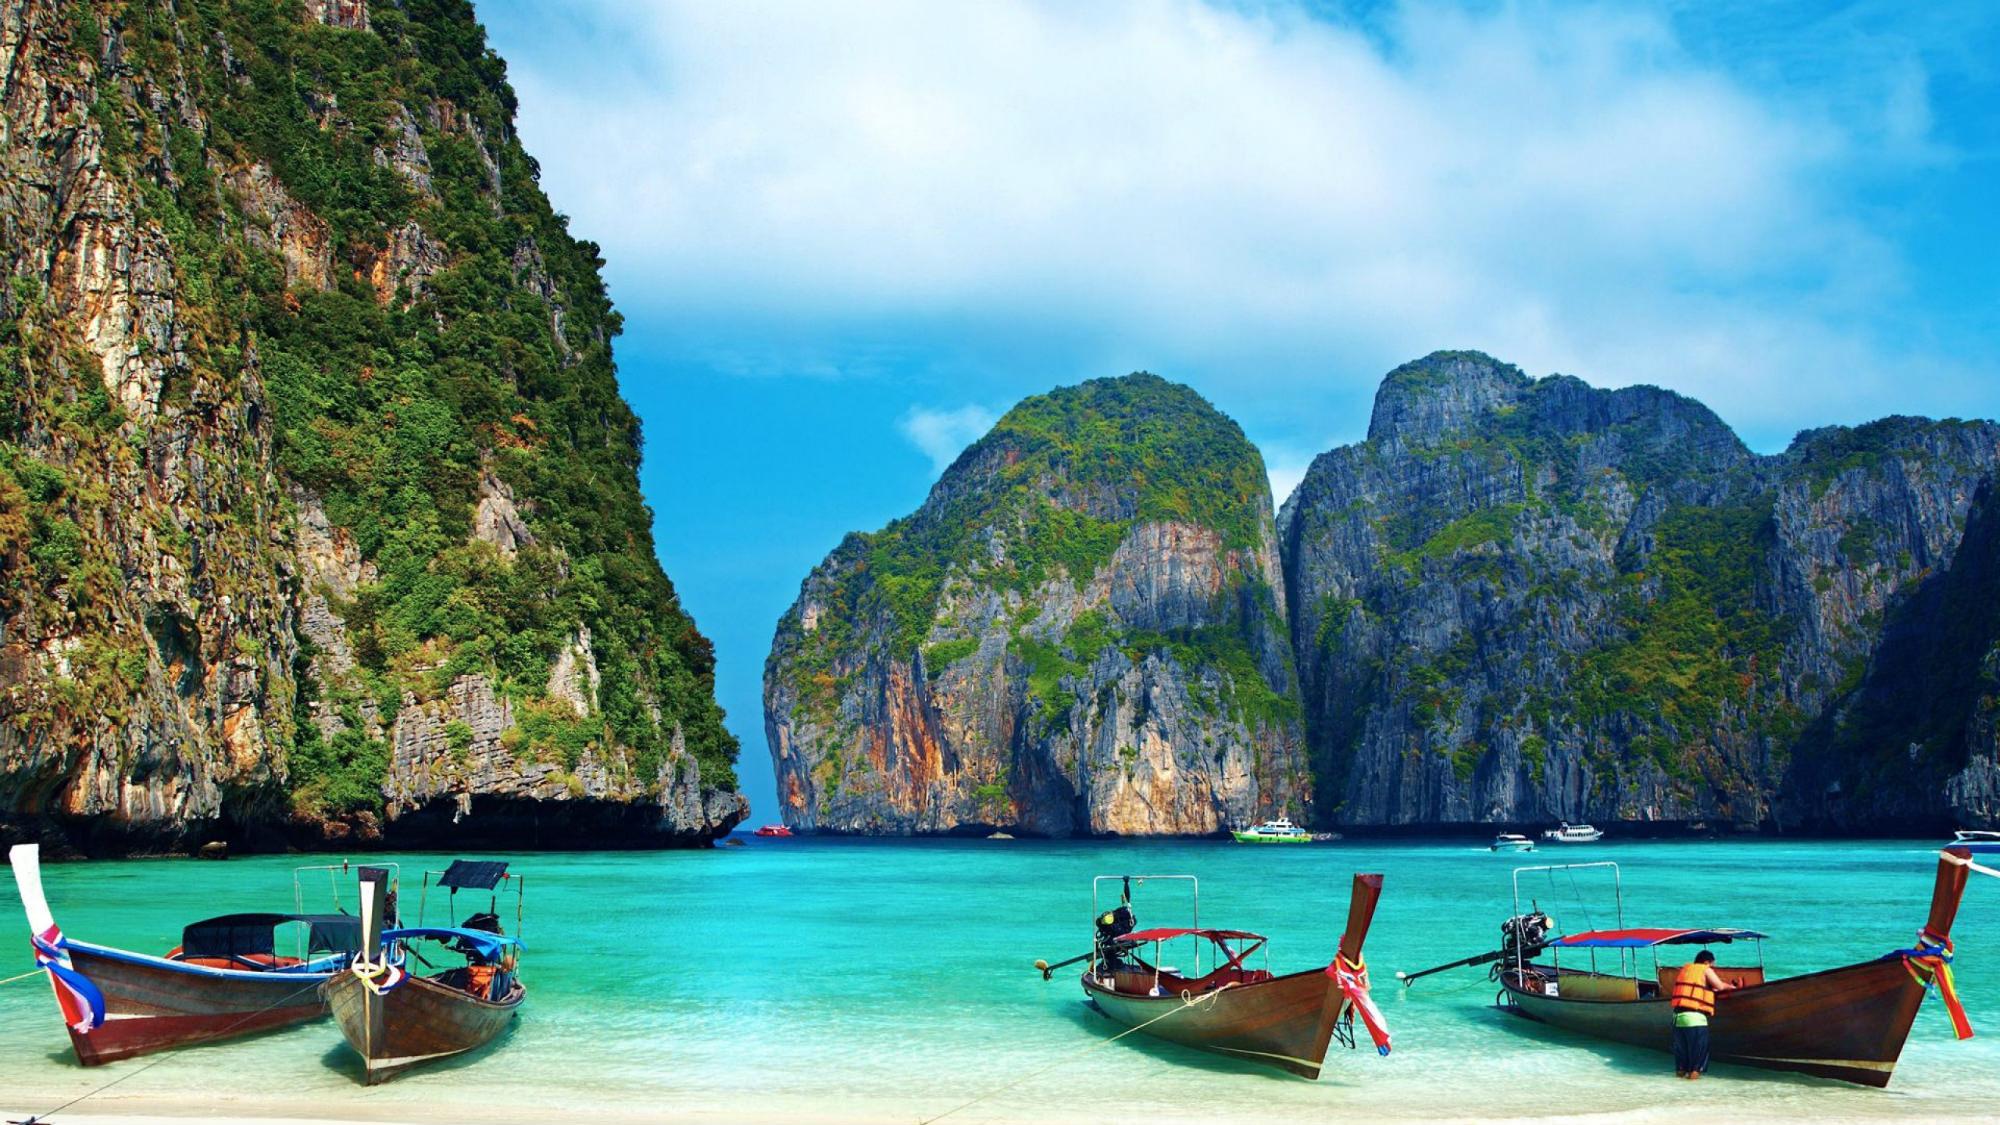 Finding 'Unusual' Travel Destinations in Thailand